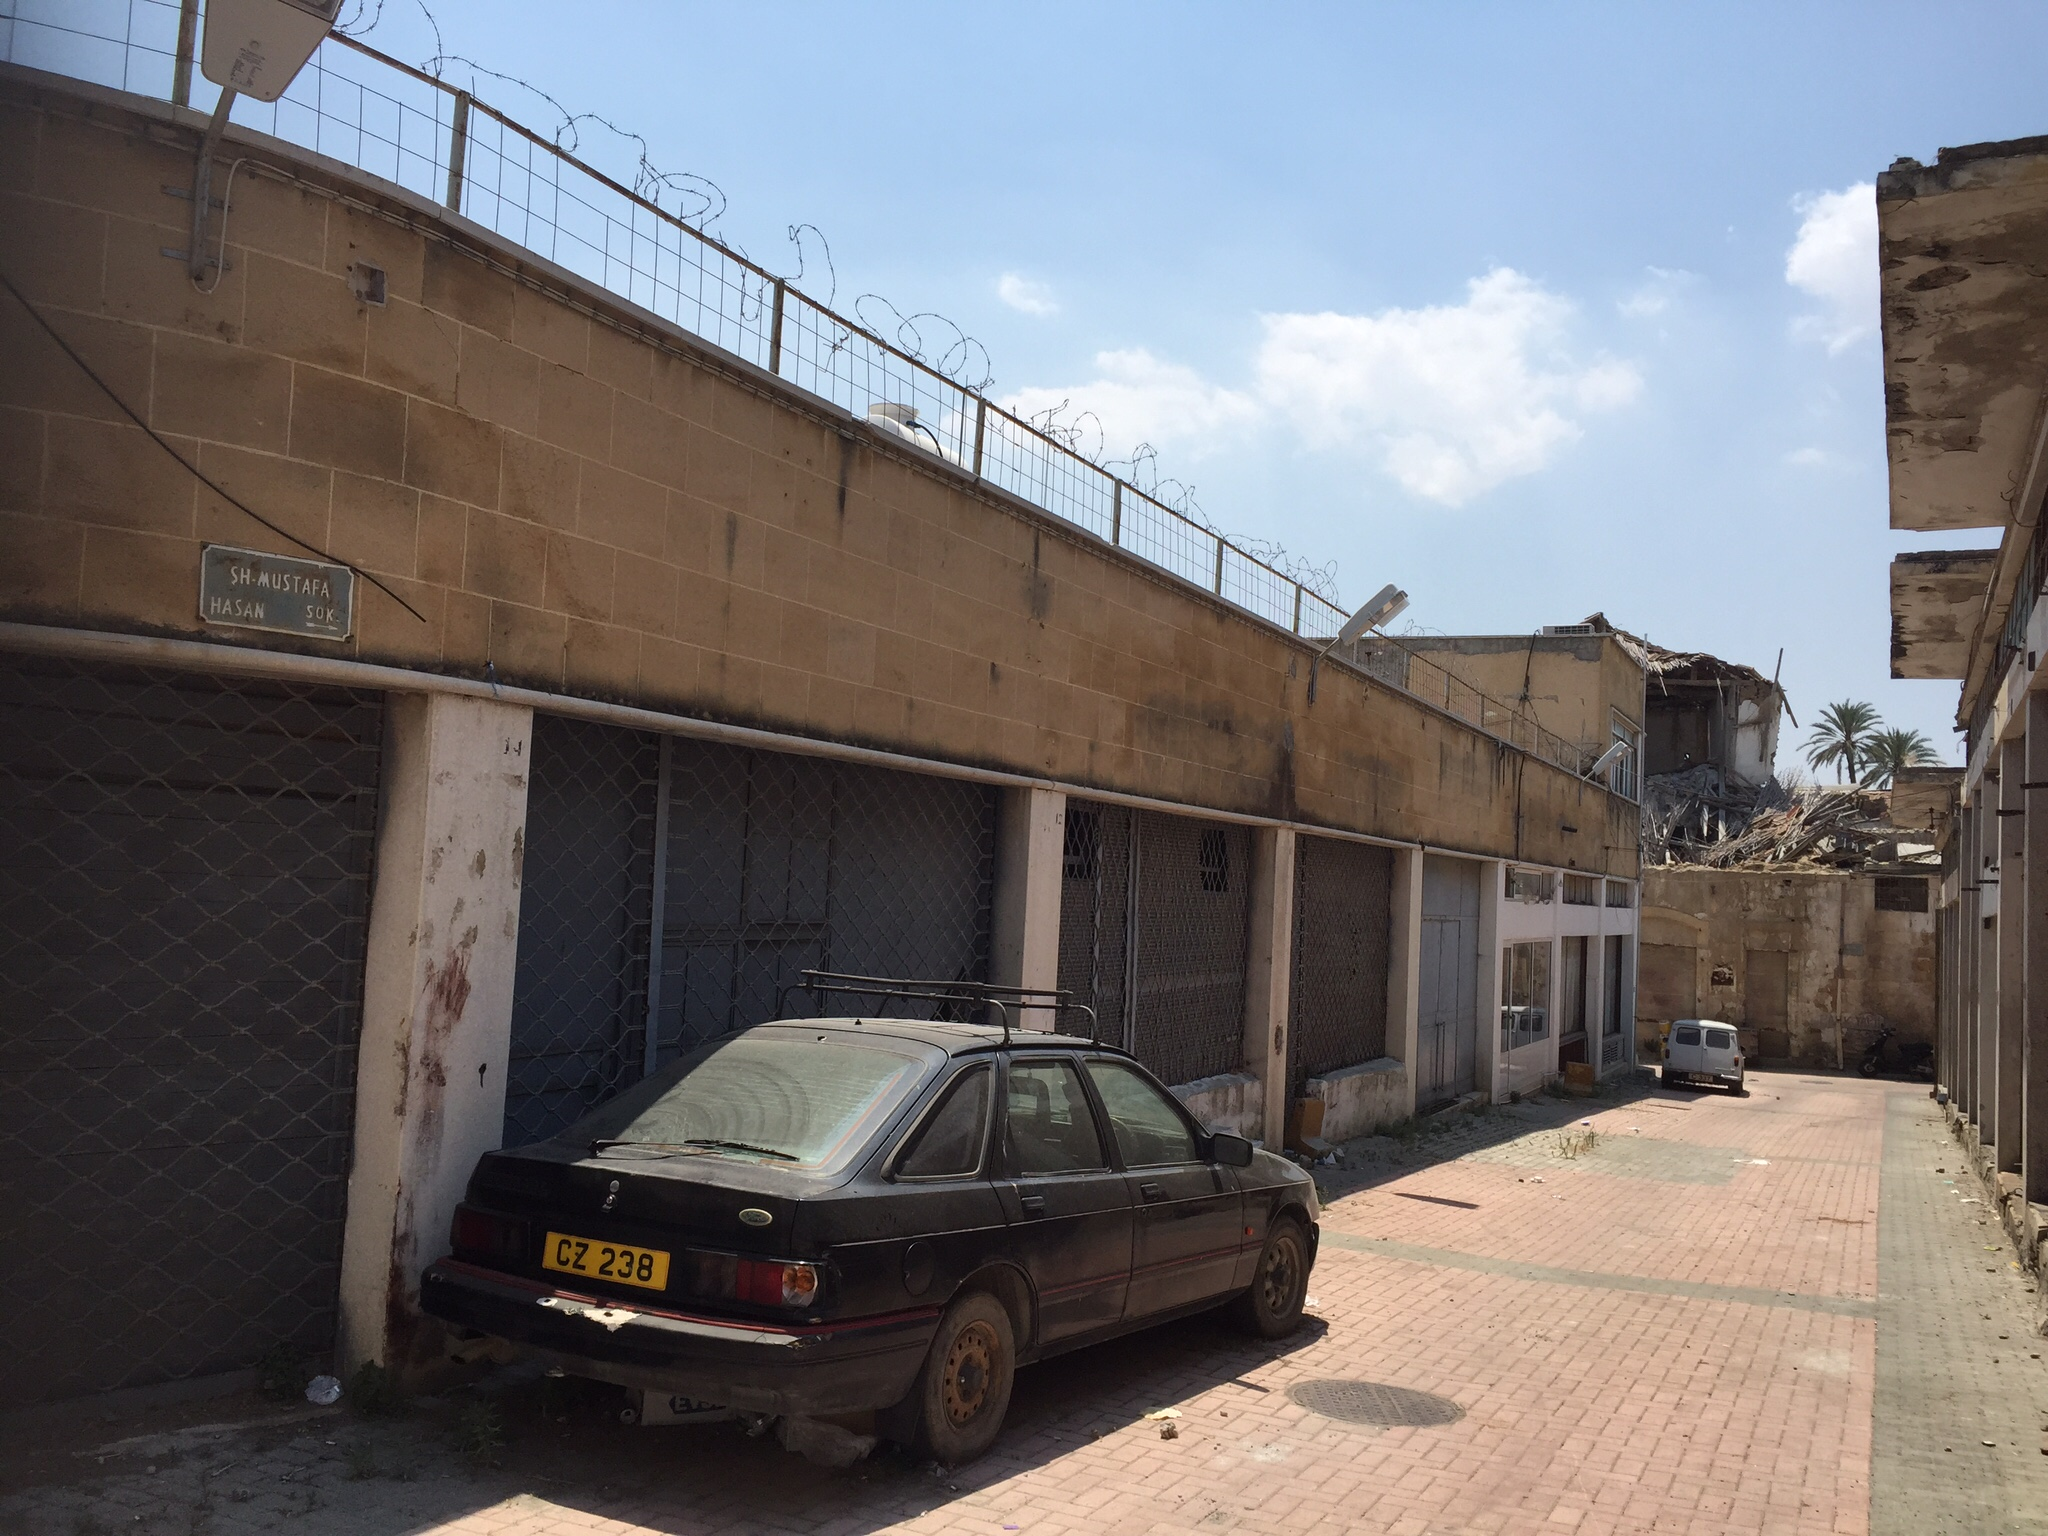 Nicosia - Tyrkisk besatte del